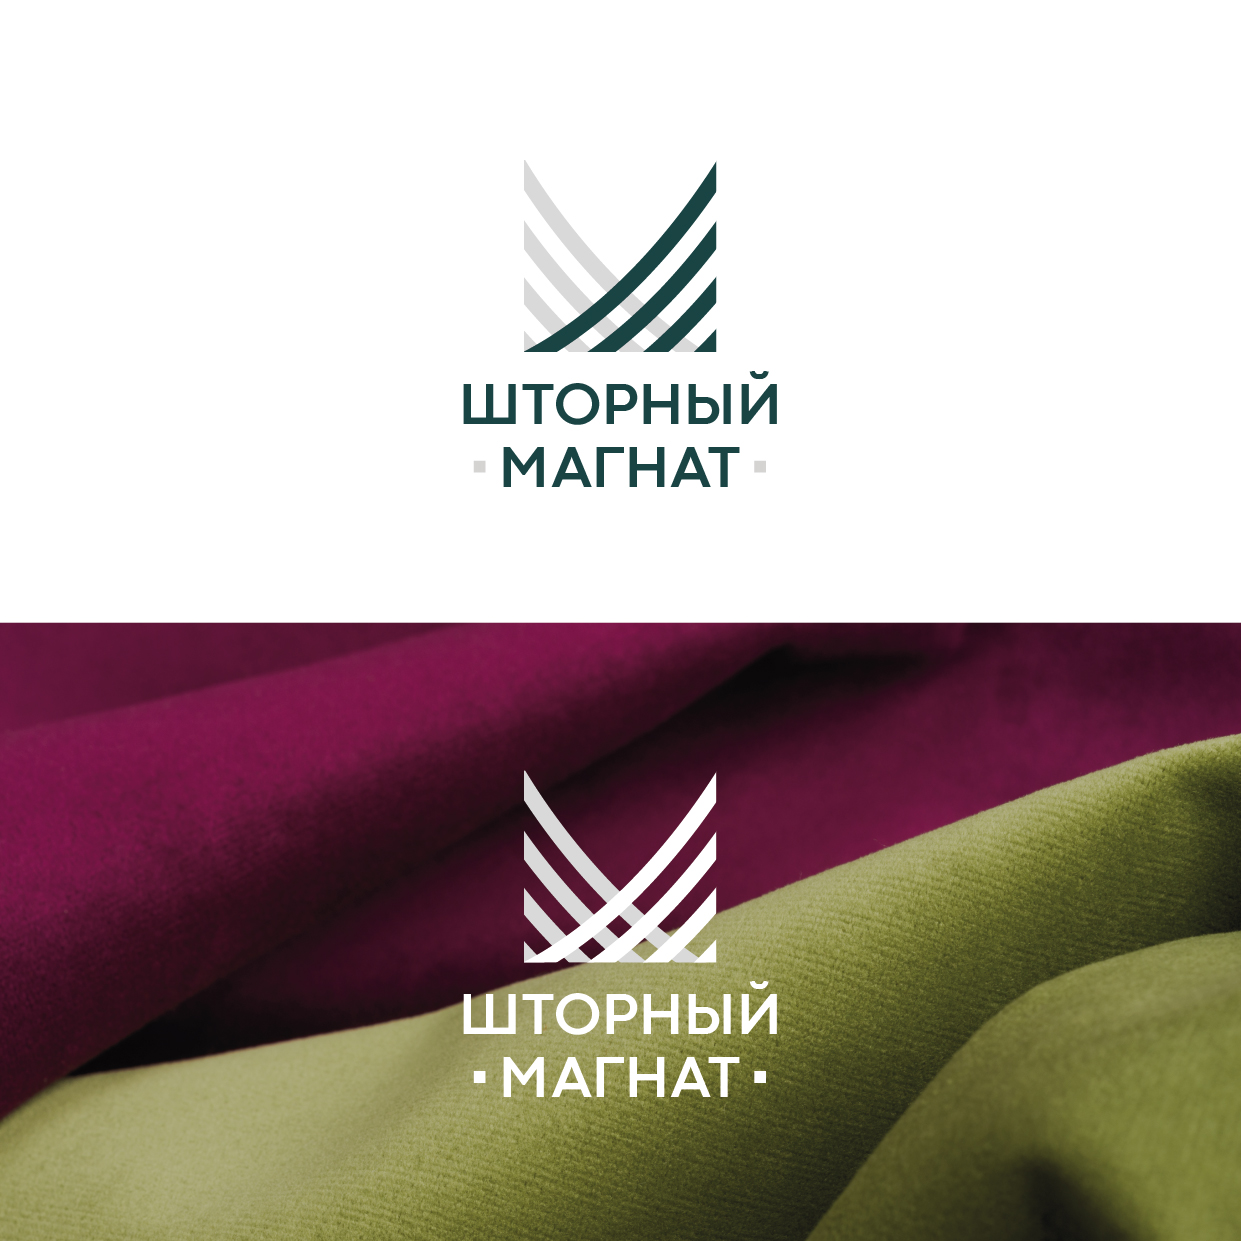 Логотип и фирменный стиль для магазина тканей. фото f_5455cdbf6529a2e0.jpg